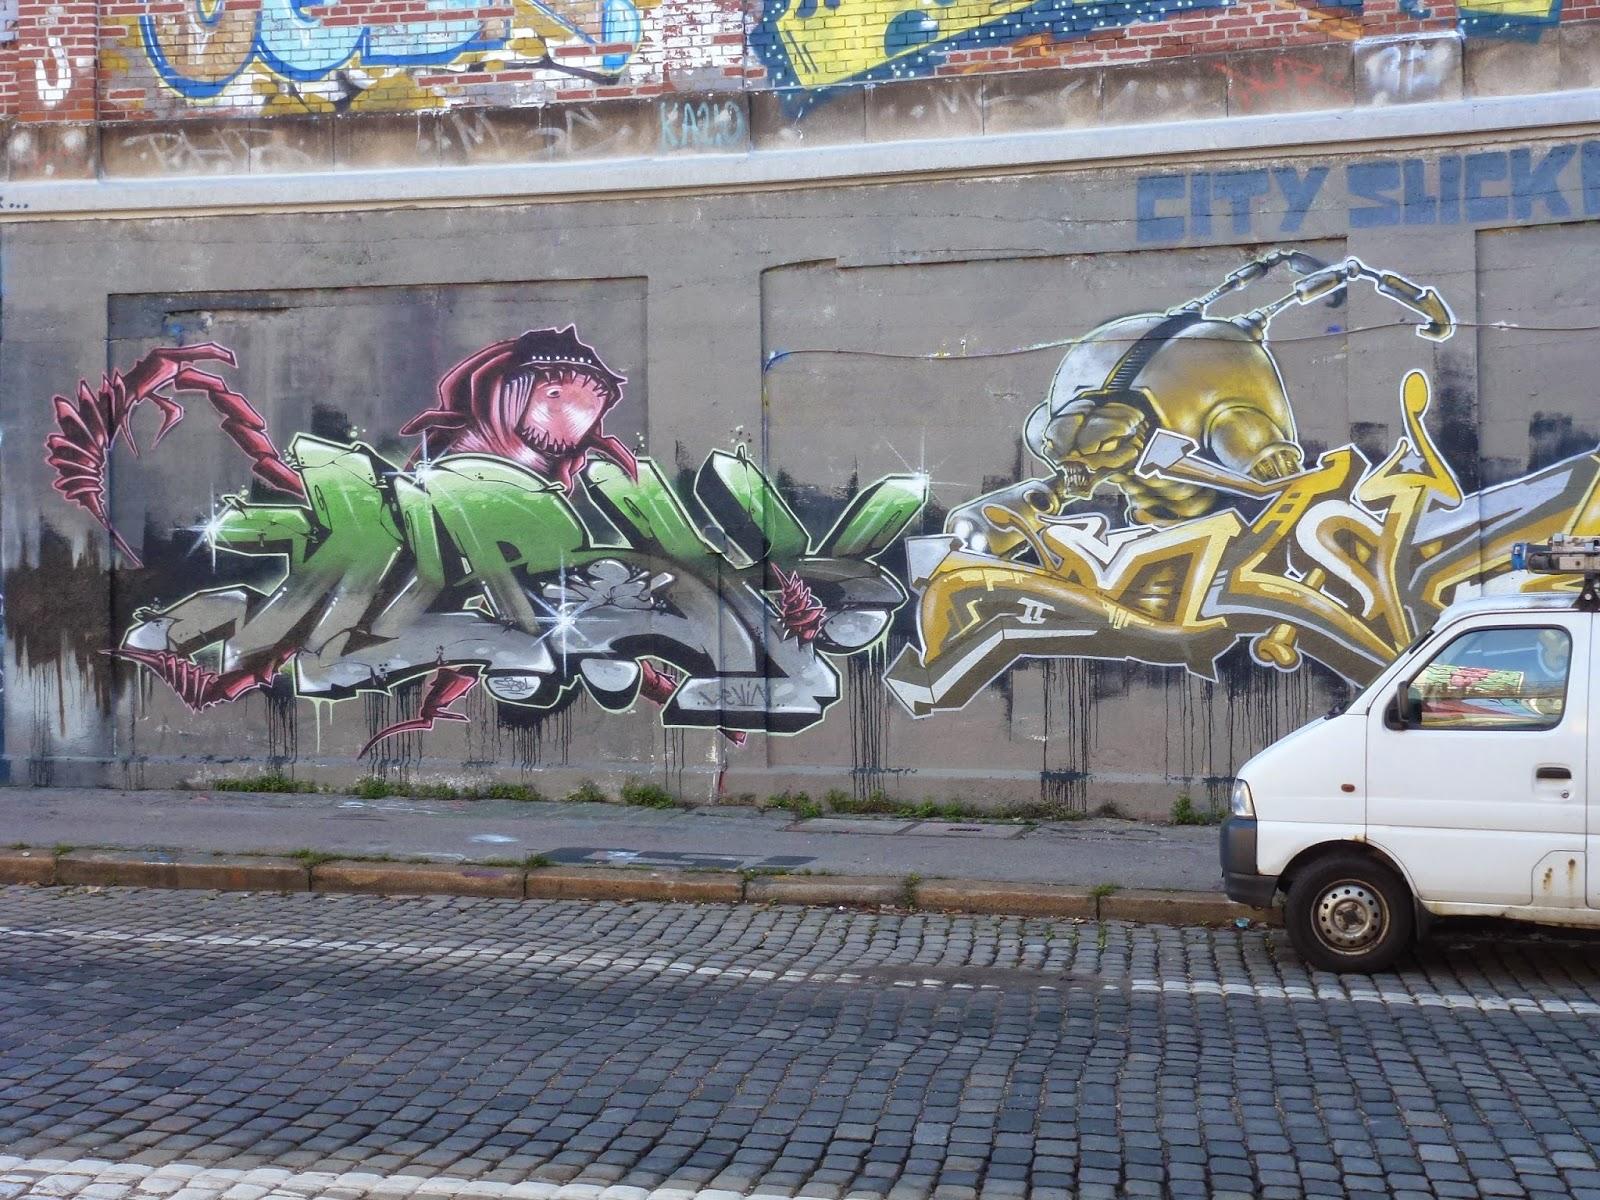 streetart und urbane kommunikation in m nchen city slickaz tumblingerstra e. Black Bedroom Furniture Sets. Home Design Ideas